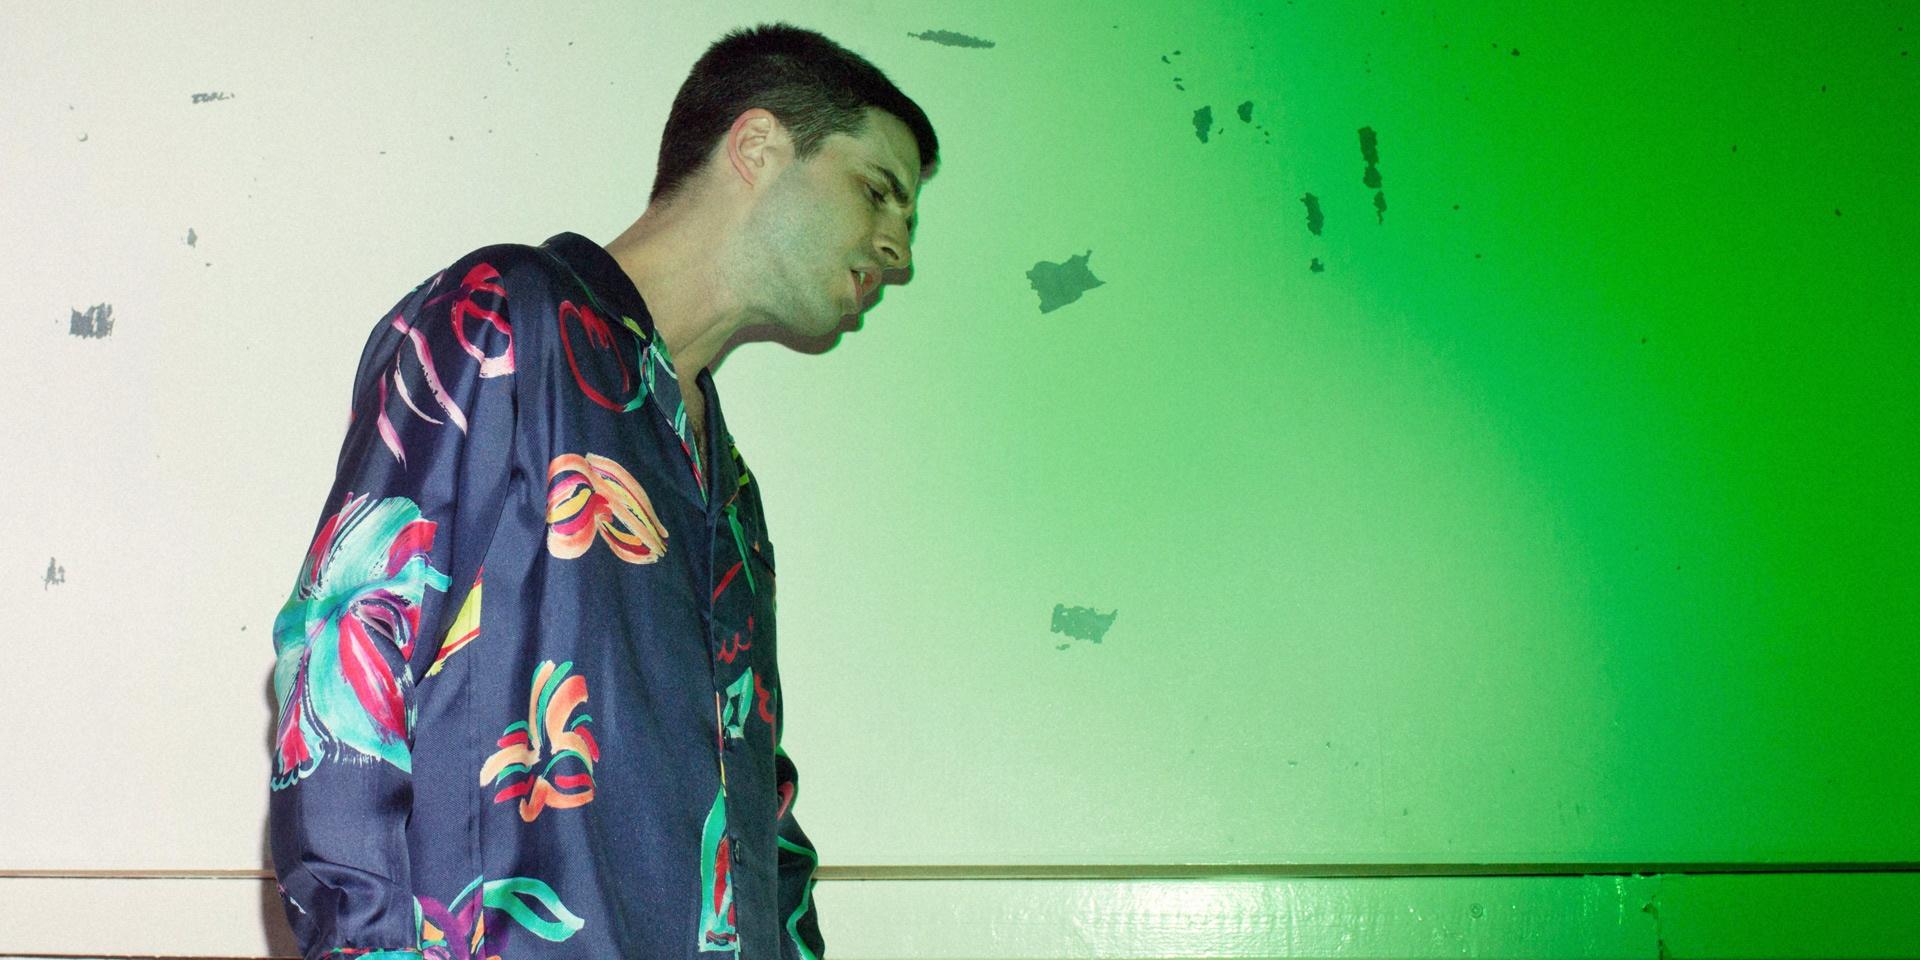 UNKNWN to close 2019 with Kornél Kovács show